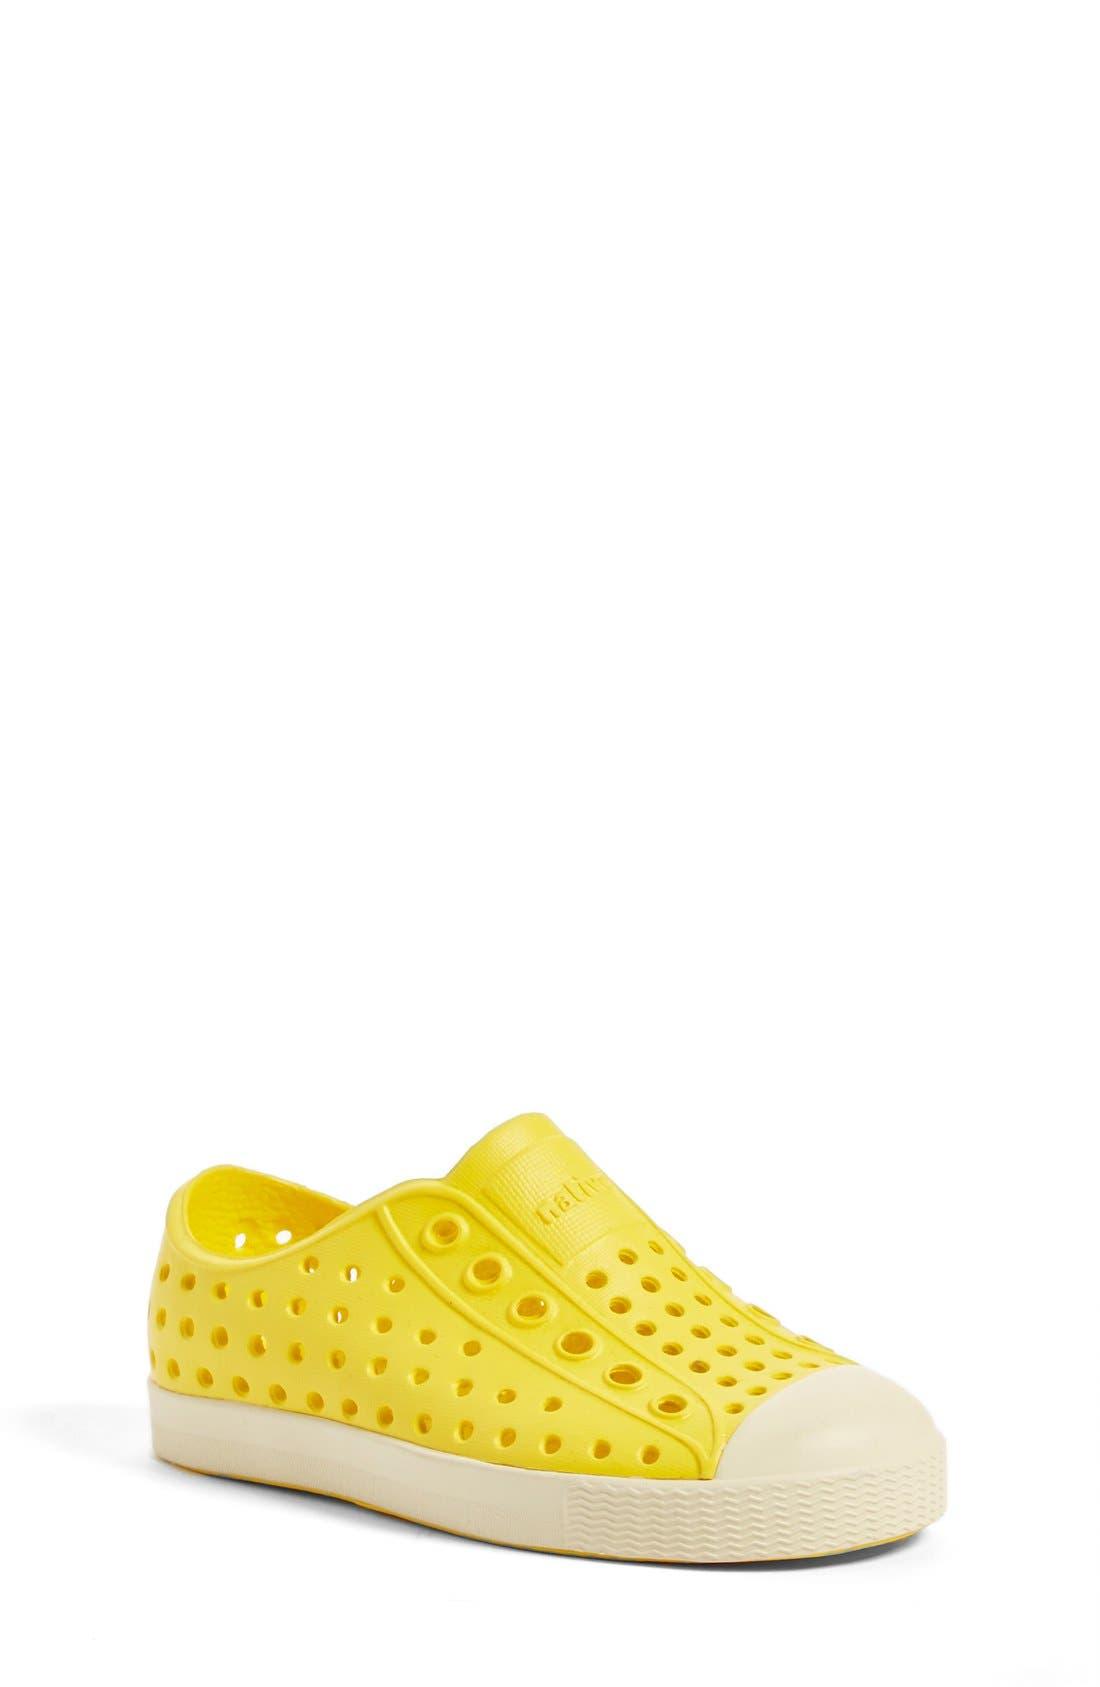 'Jefferson' Water Friendly Slip-On Sneaker,                             Main thumbnail 63, color,